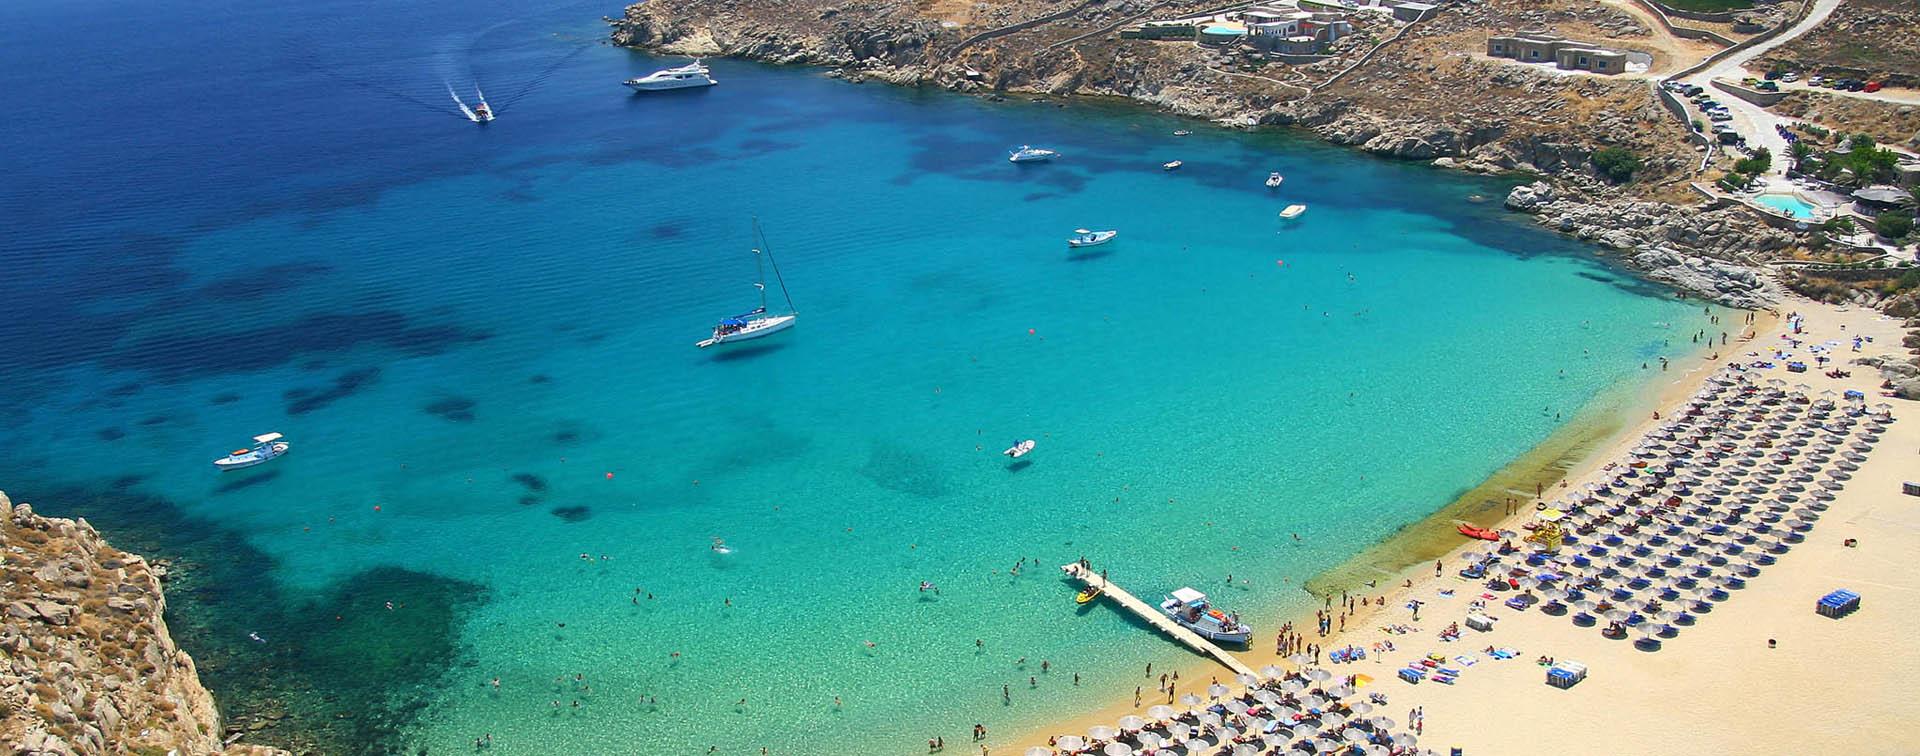 Best Island Beaches For Partying Mykonos St Barts: The 35 Sandy Beaches In Mykonos